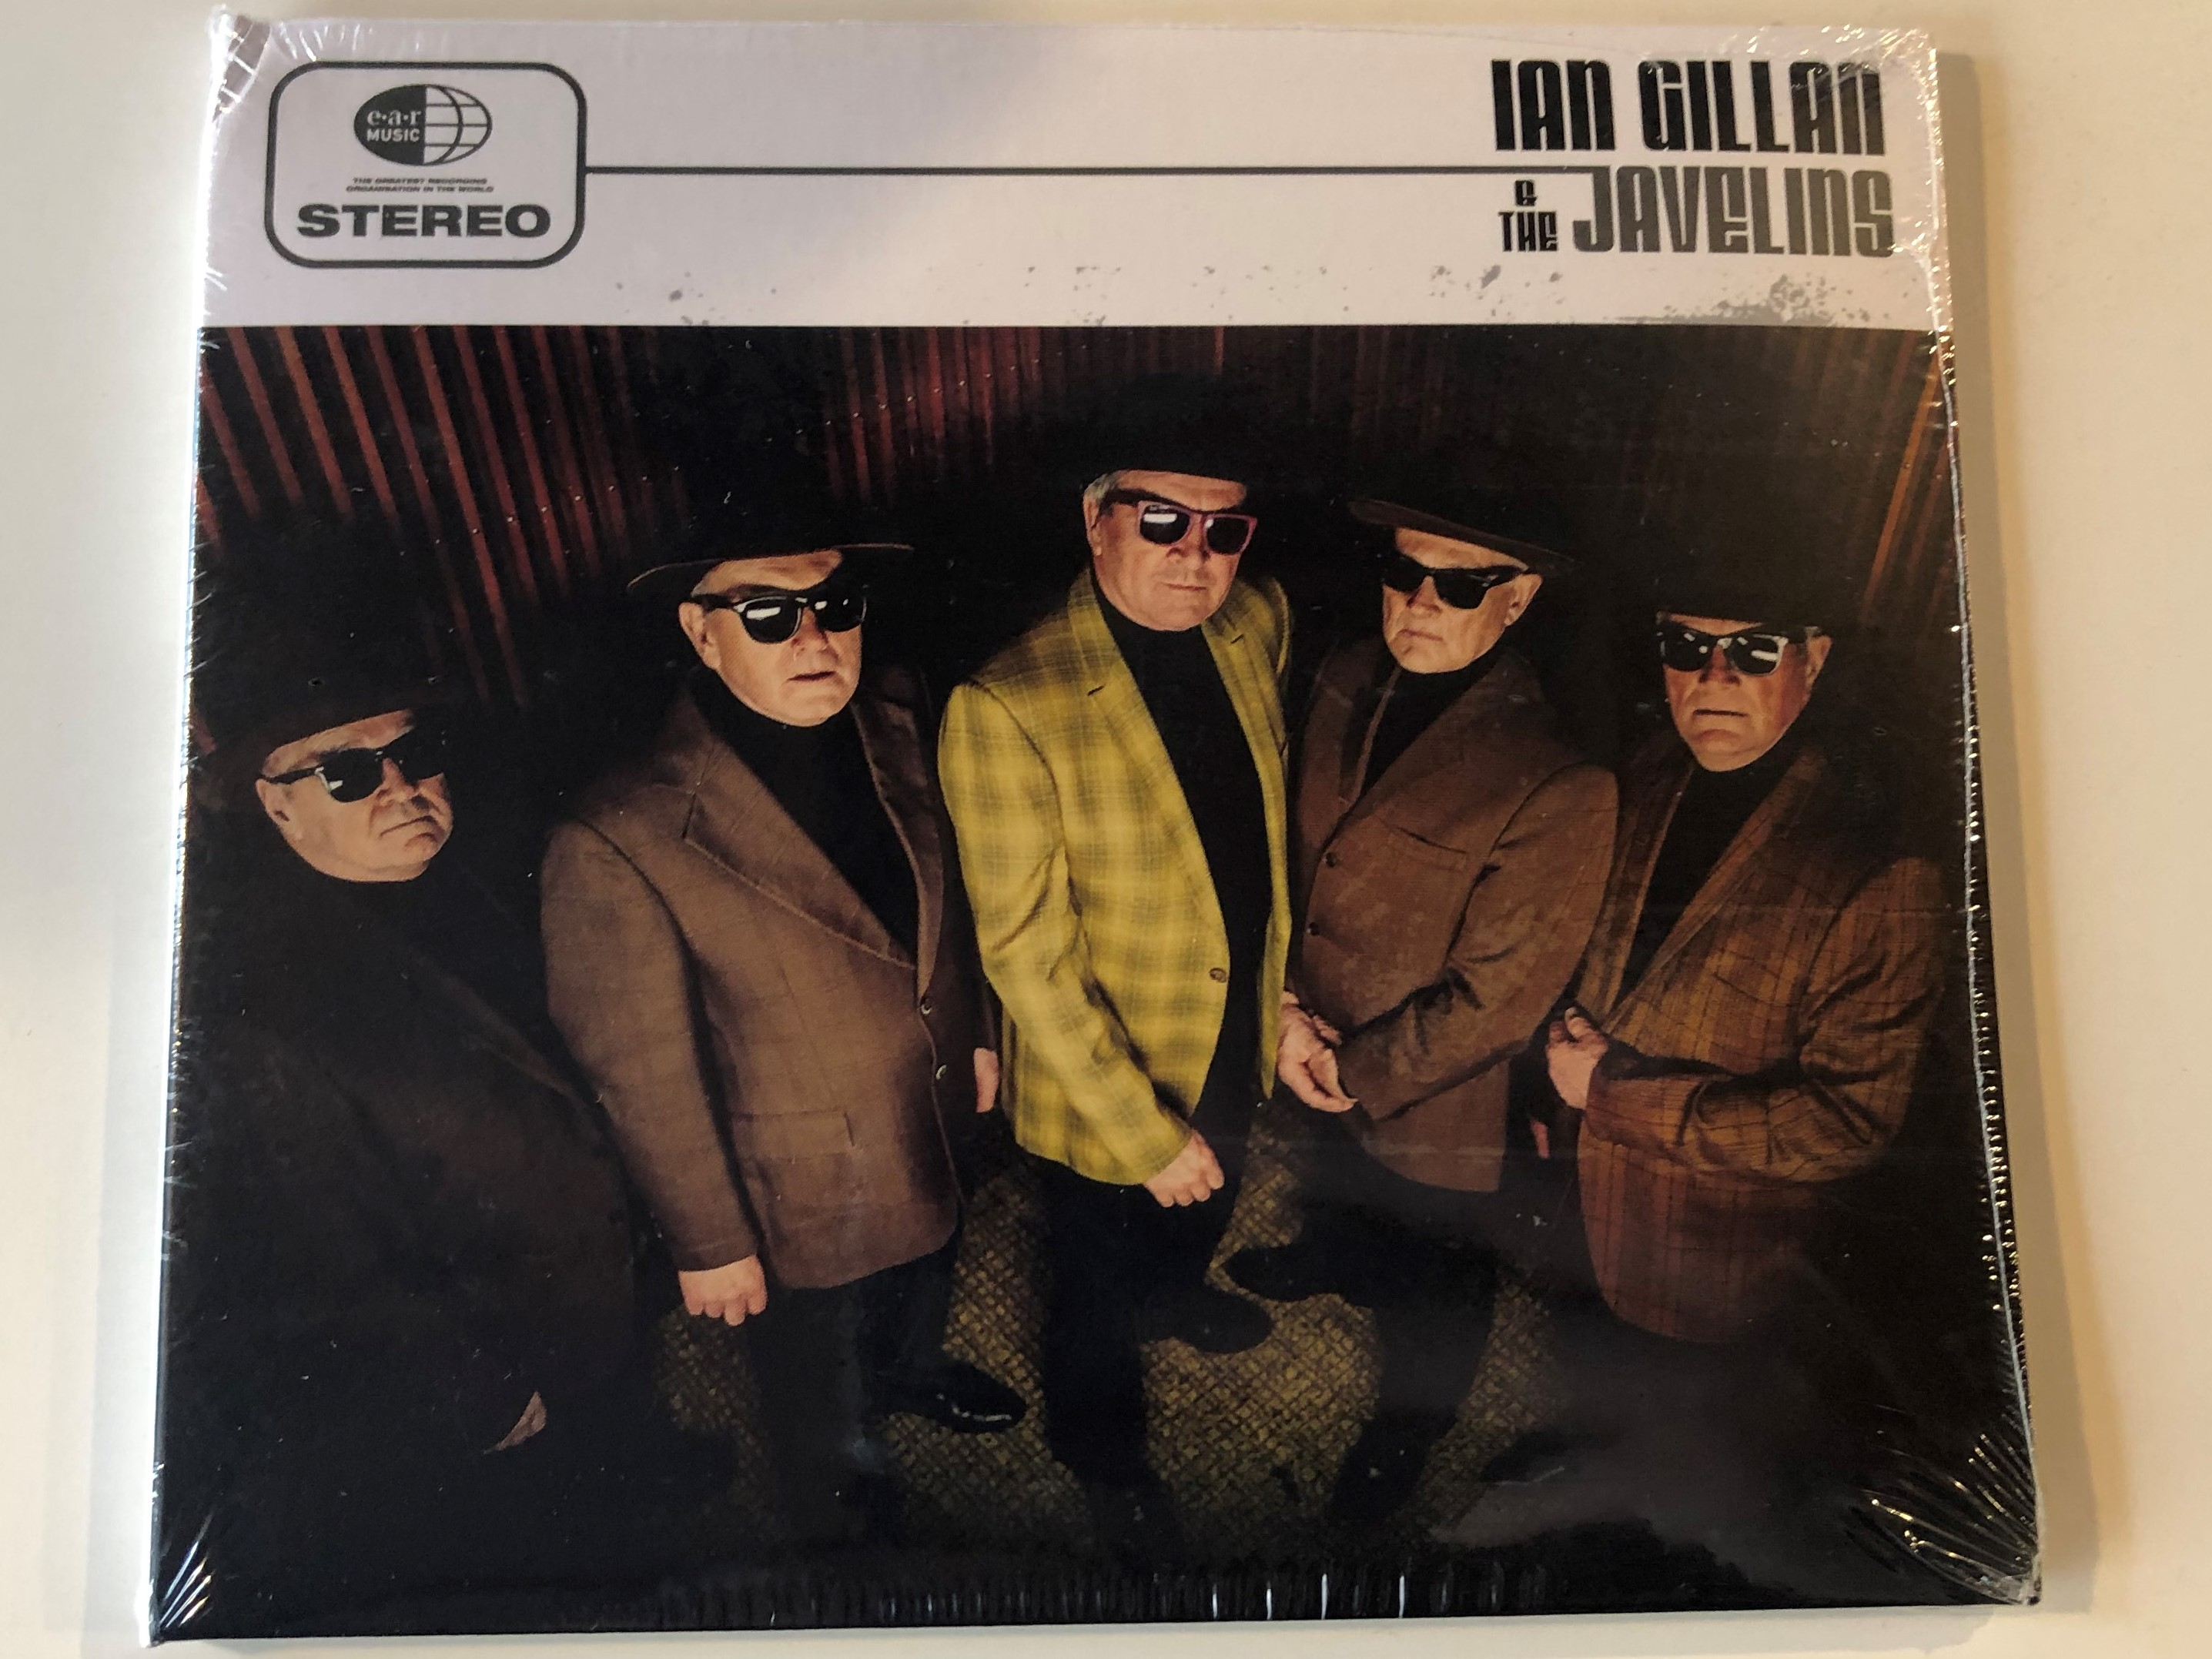 ian-gillan-the-javelins-ear-music-audio-cd-2018-0212877emu-1-.jpg